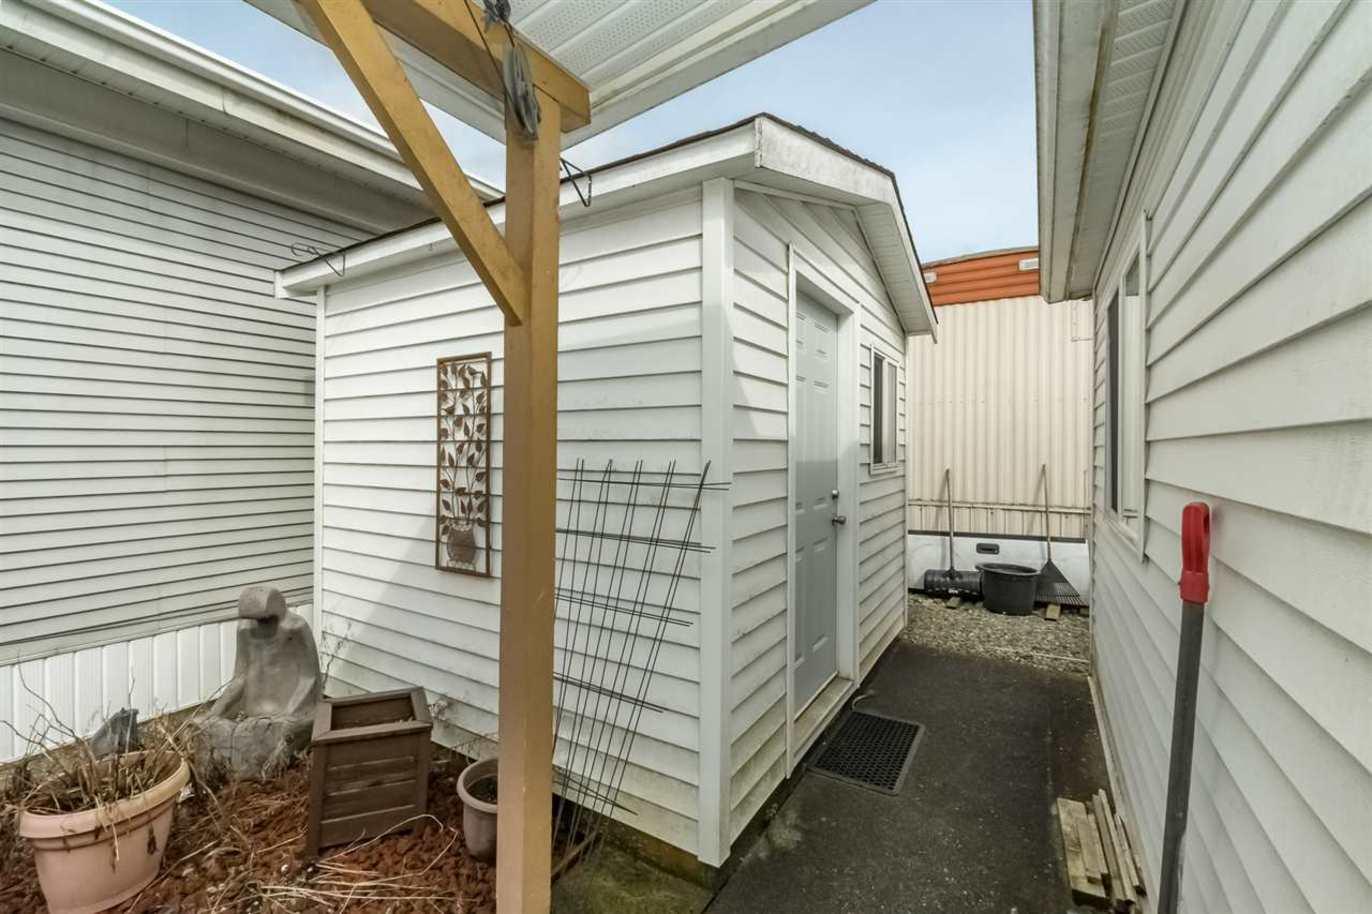 201-cayer-street-maillardville-coquitlam-15 at 86 - 201 Cayer Street, Maillardville, Coquitlam